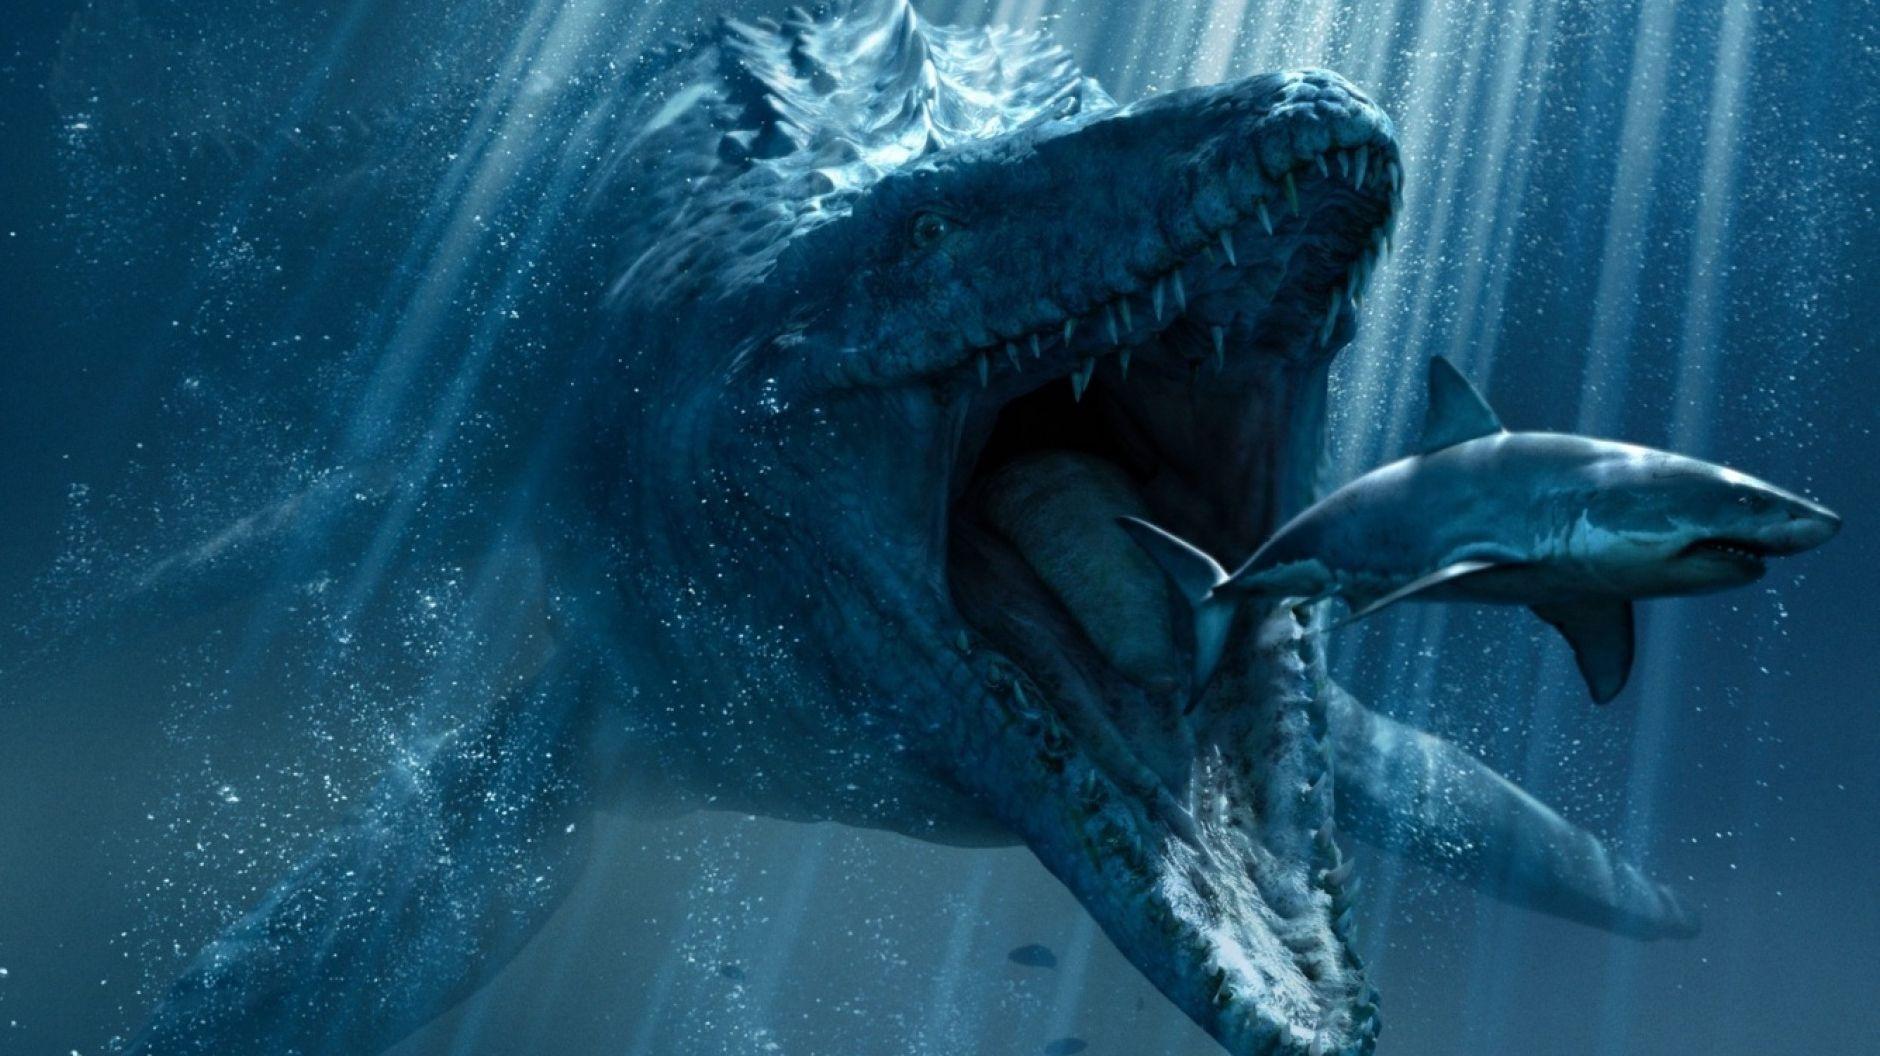 Jurassic World underwater Dinosaur eating shark